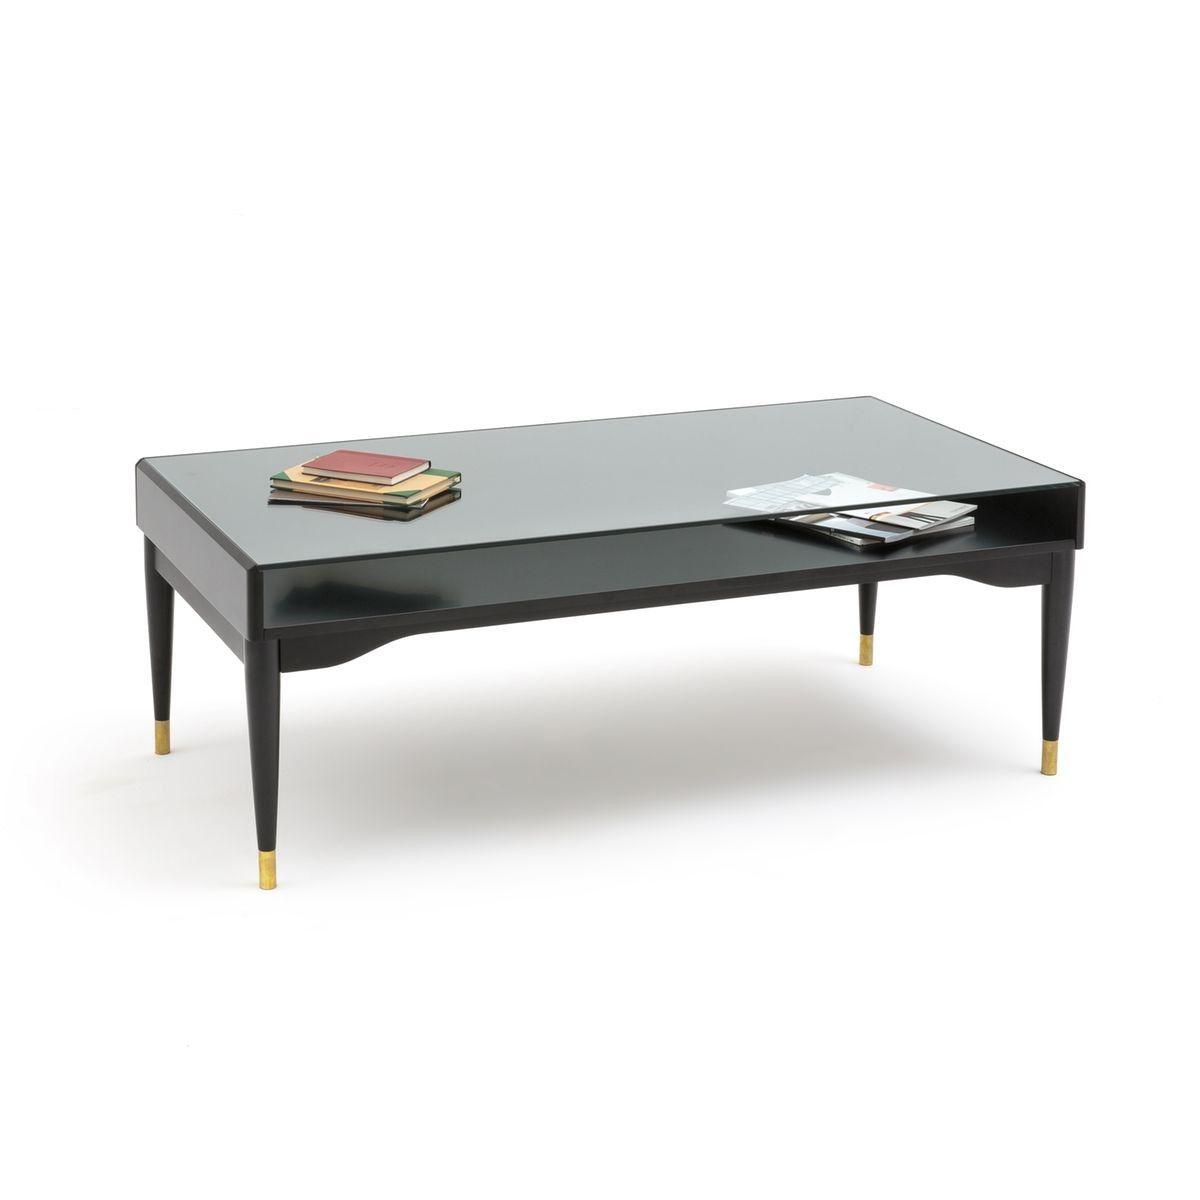 Table Basse Vitrine Novani Products Table Basse Vitrine Table Basse Et Mobilier De Salon